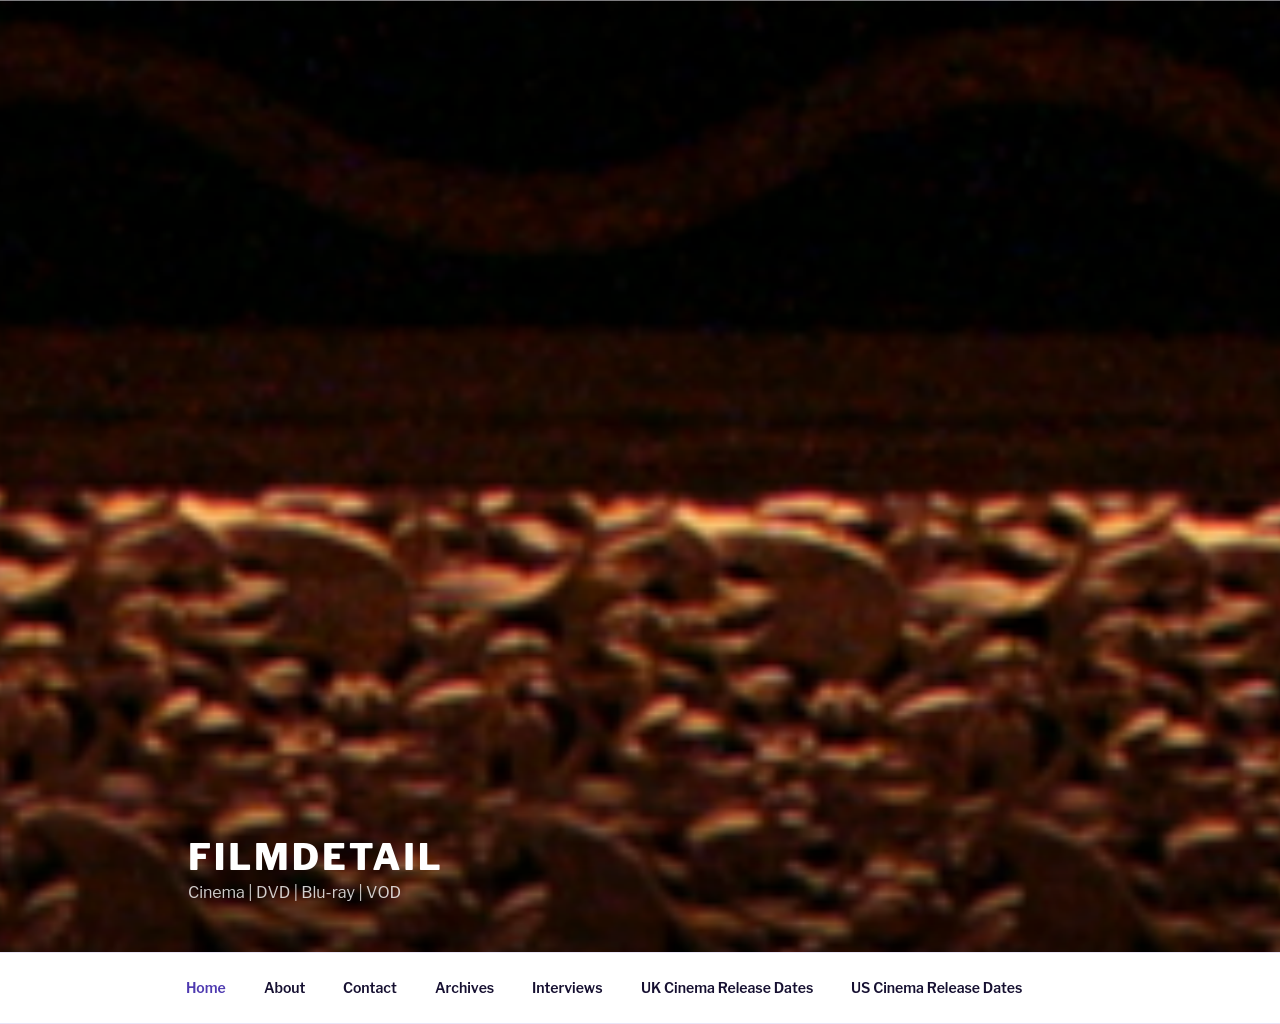 FILMdetail-Advertising-Reviews-Pricing